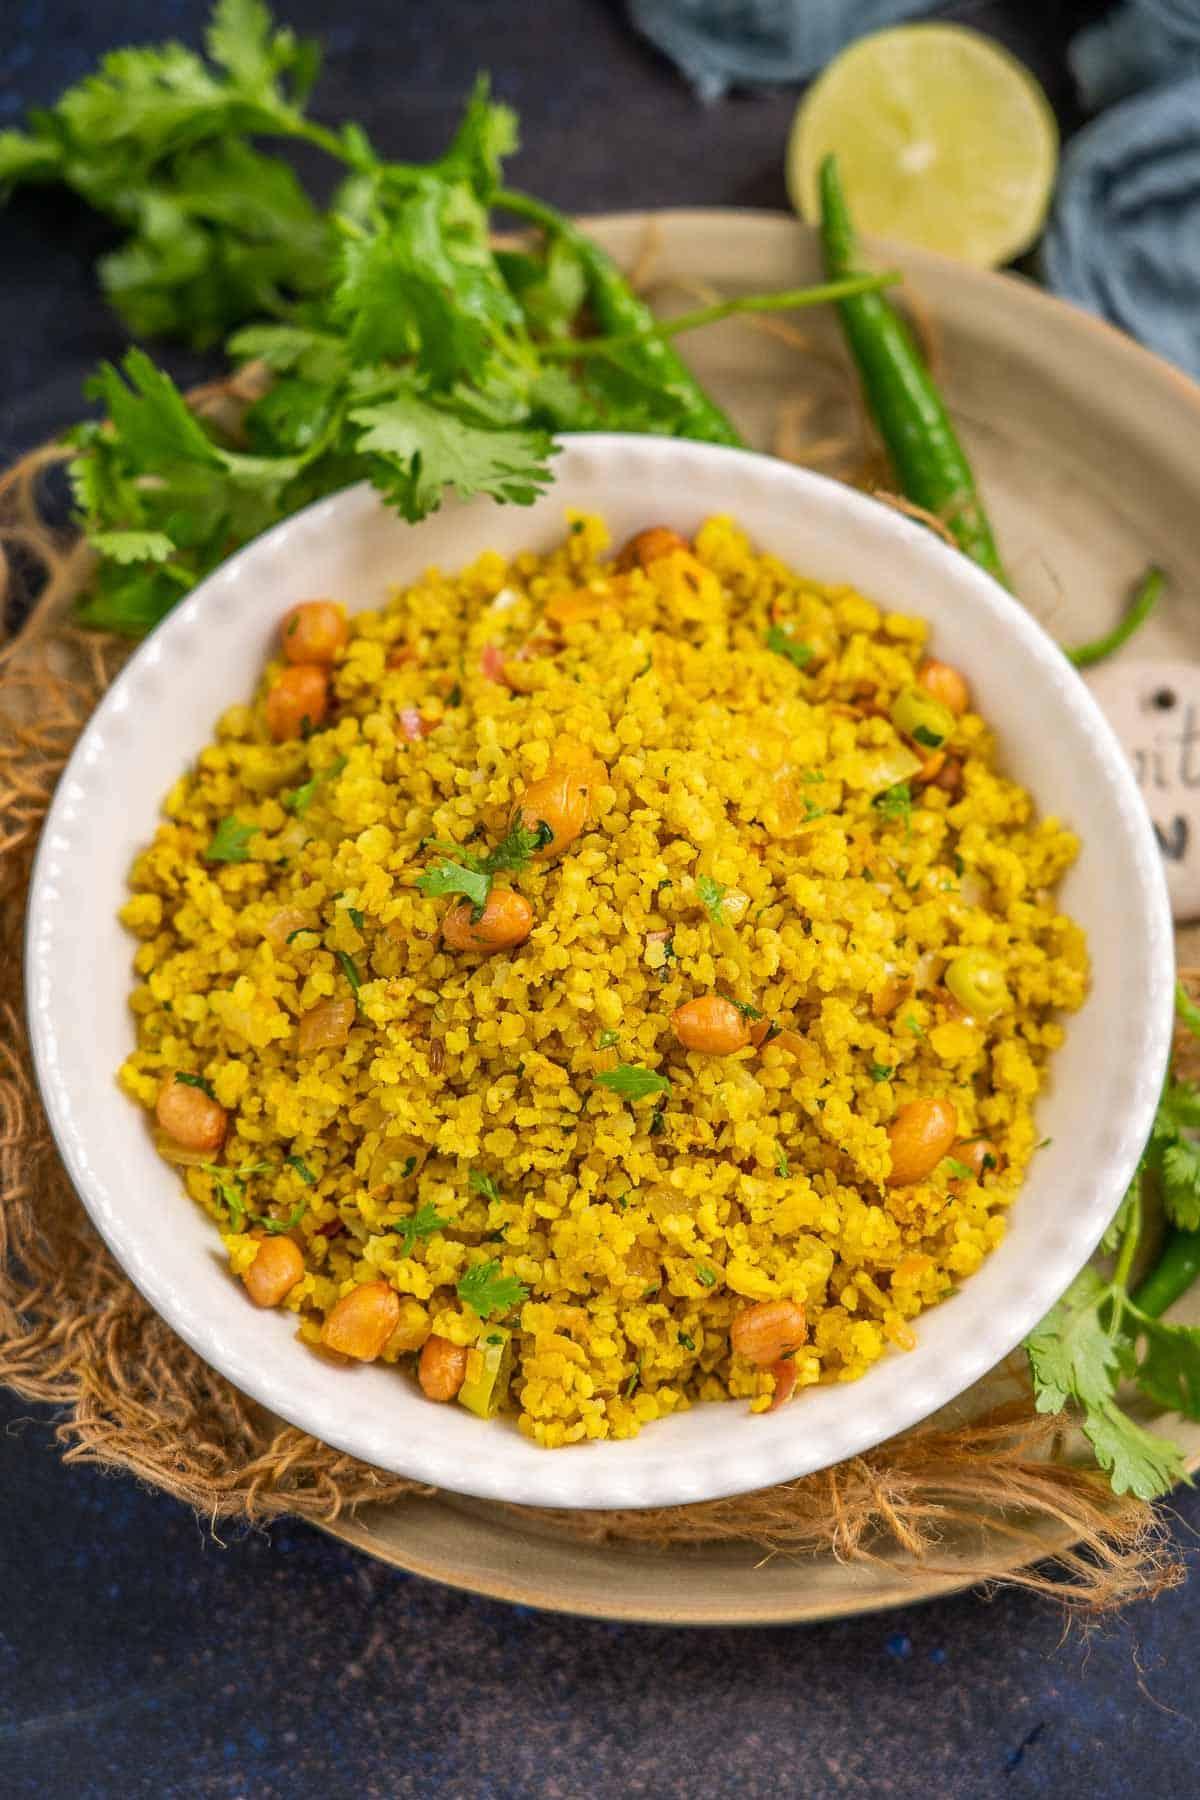 Millet poha served in a bowl.